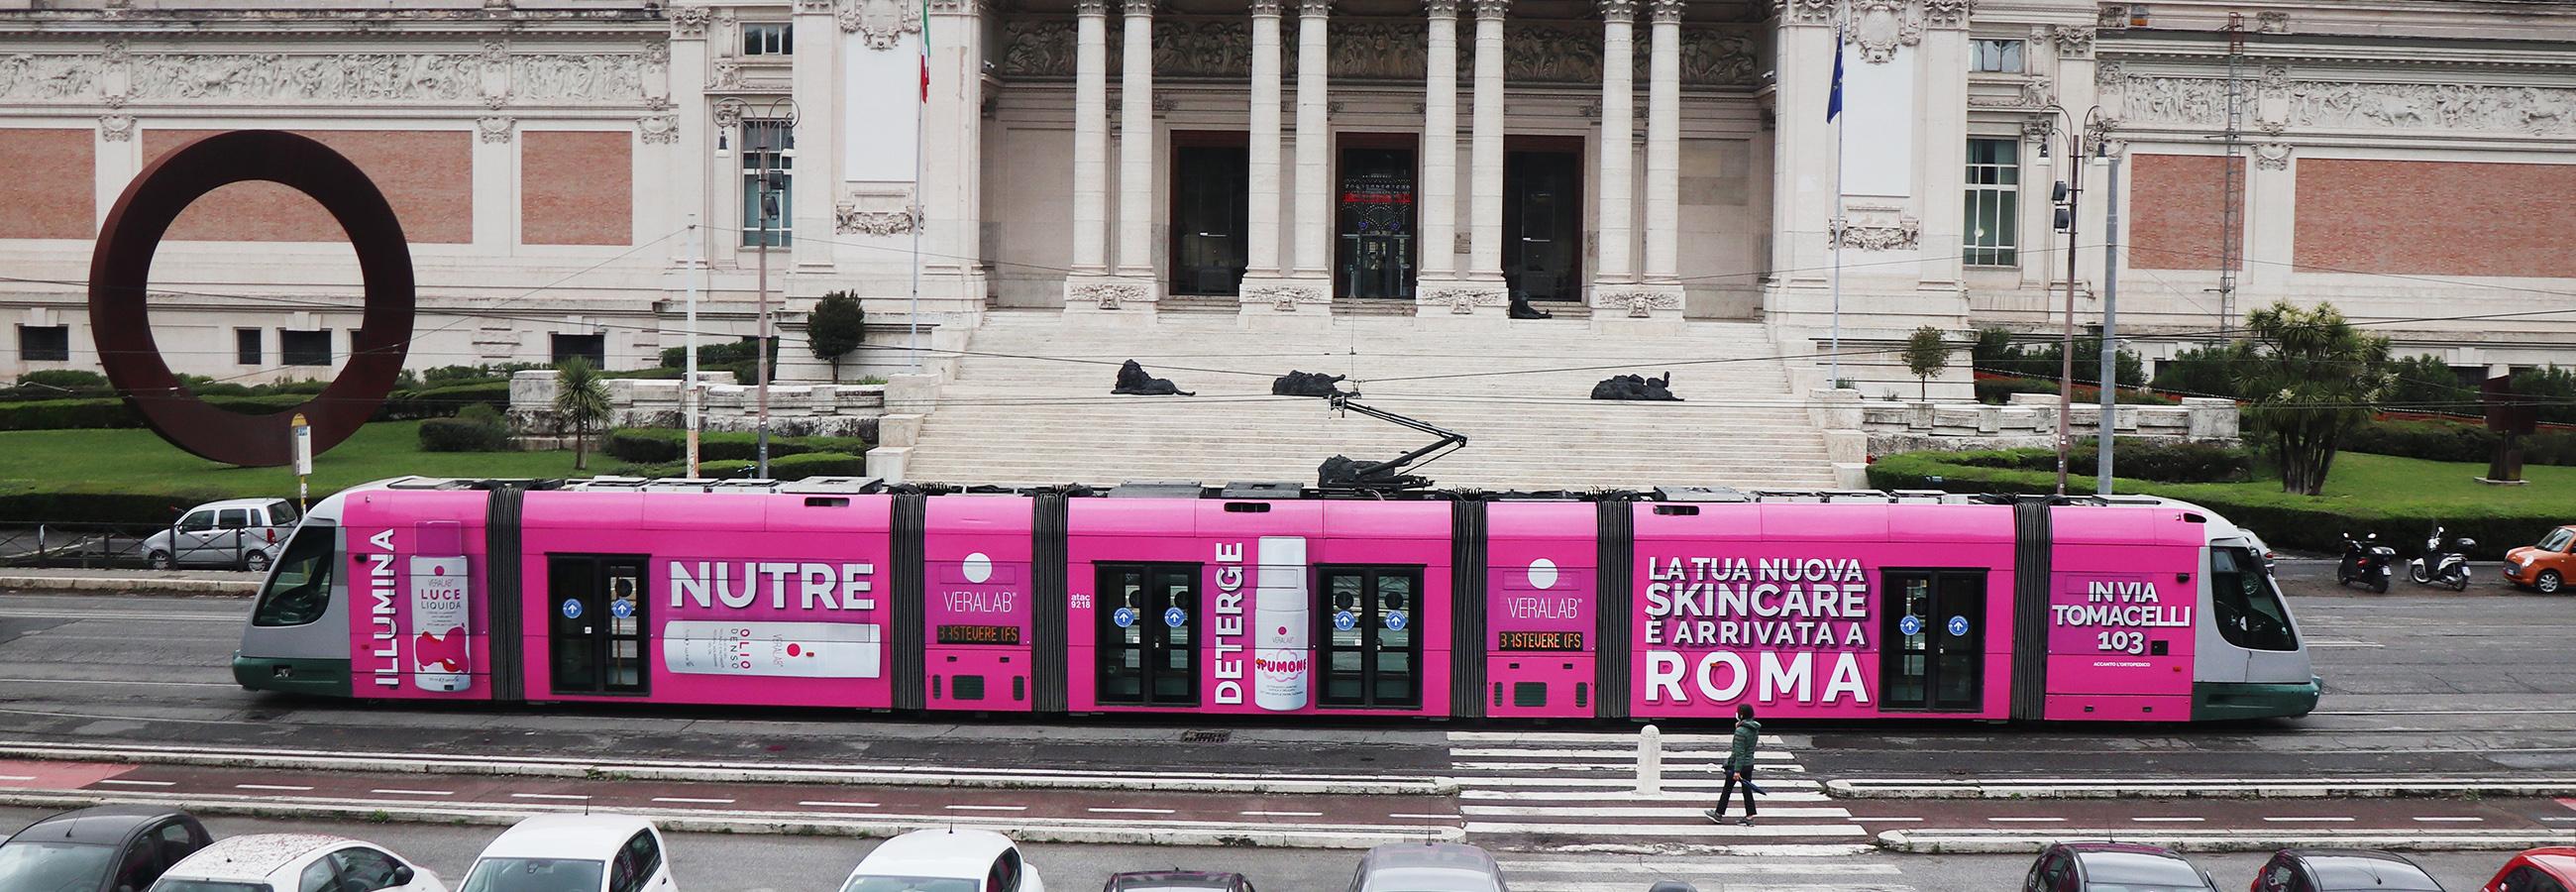 Banner Full-Wrap campagna OOH Roma per L'Estetista Cinica